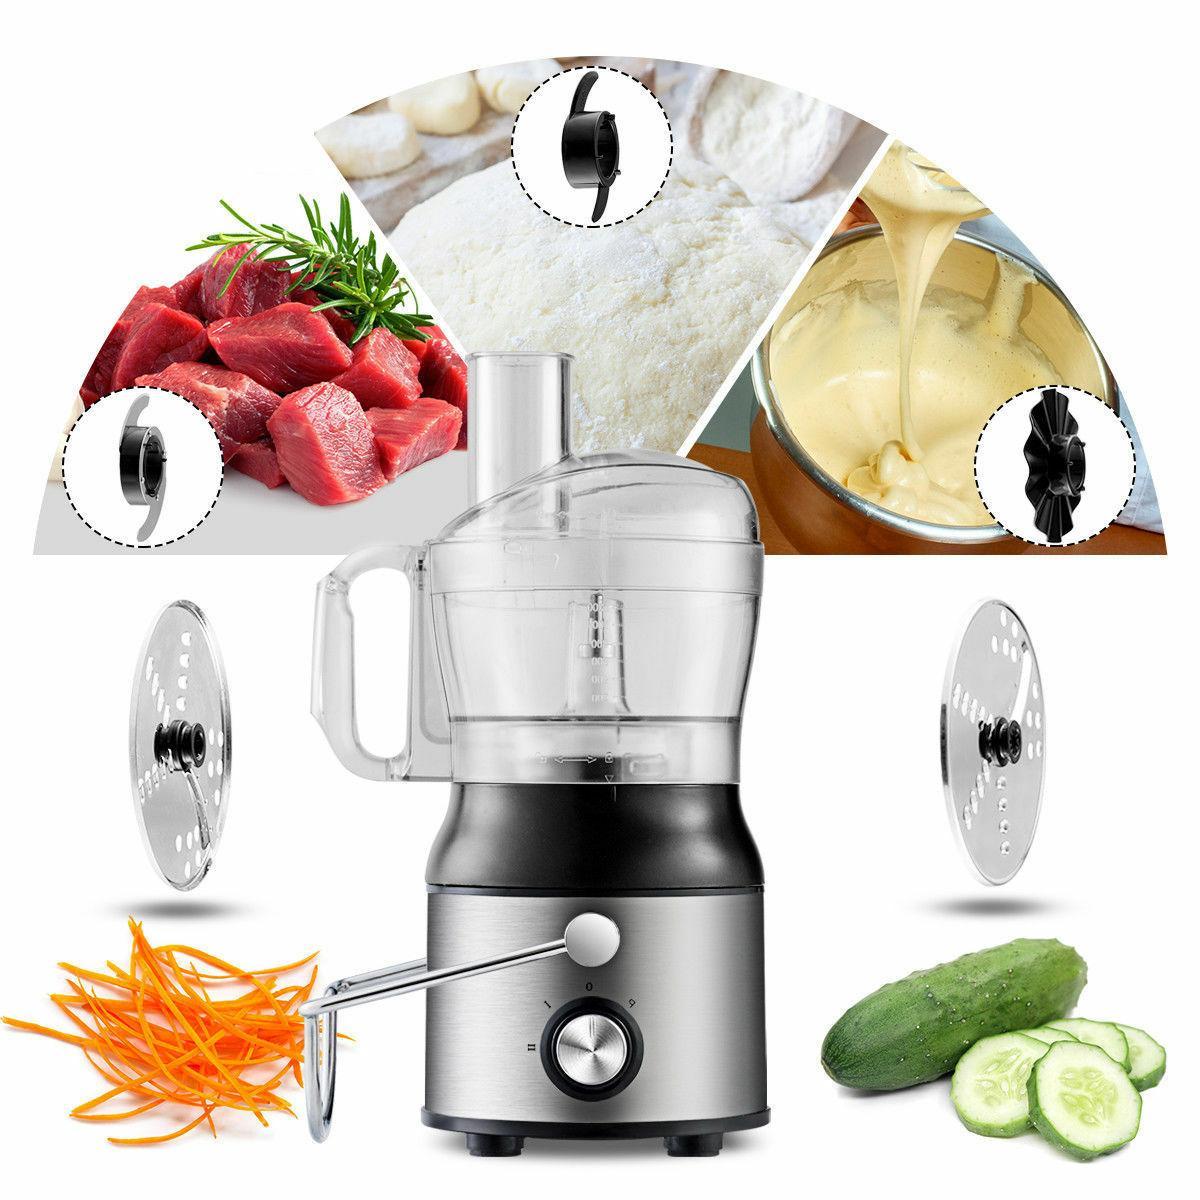 5in1 Multifunction Extractor Juicer Blender Chopper Food